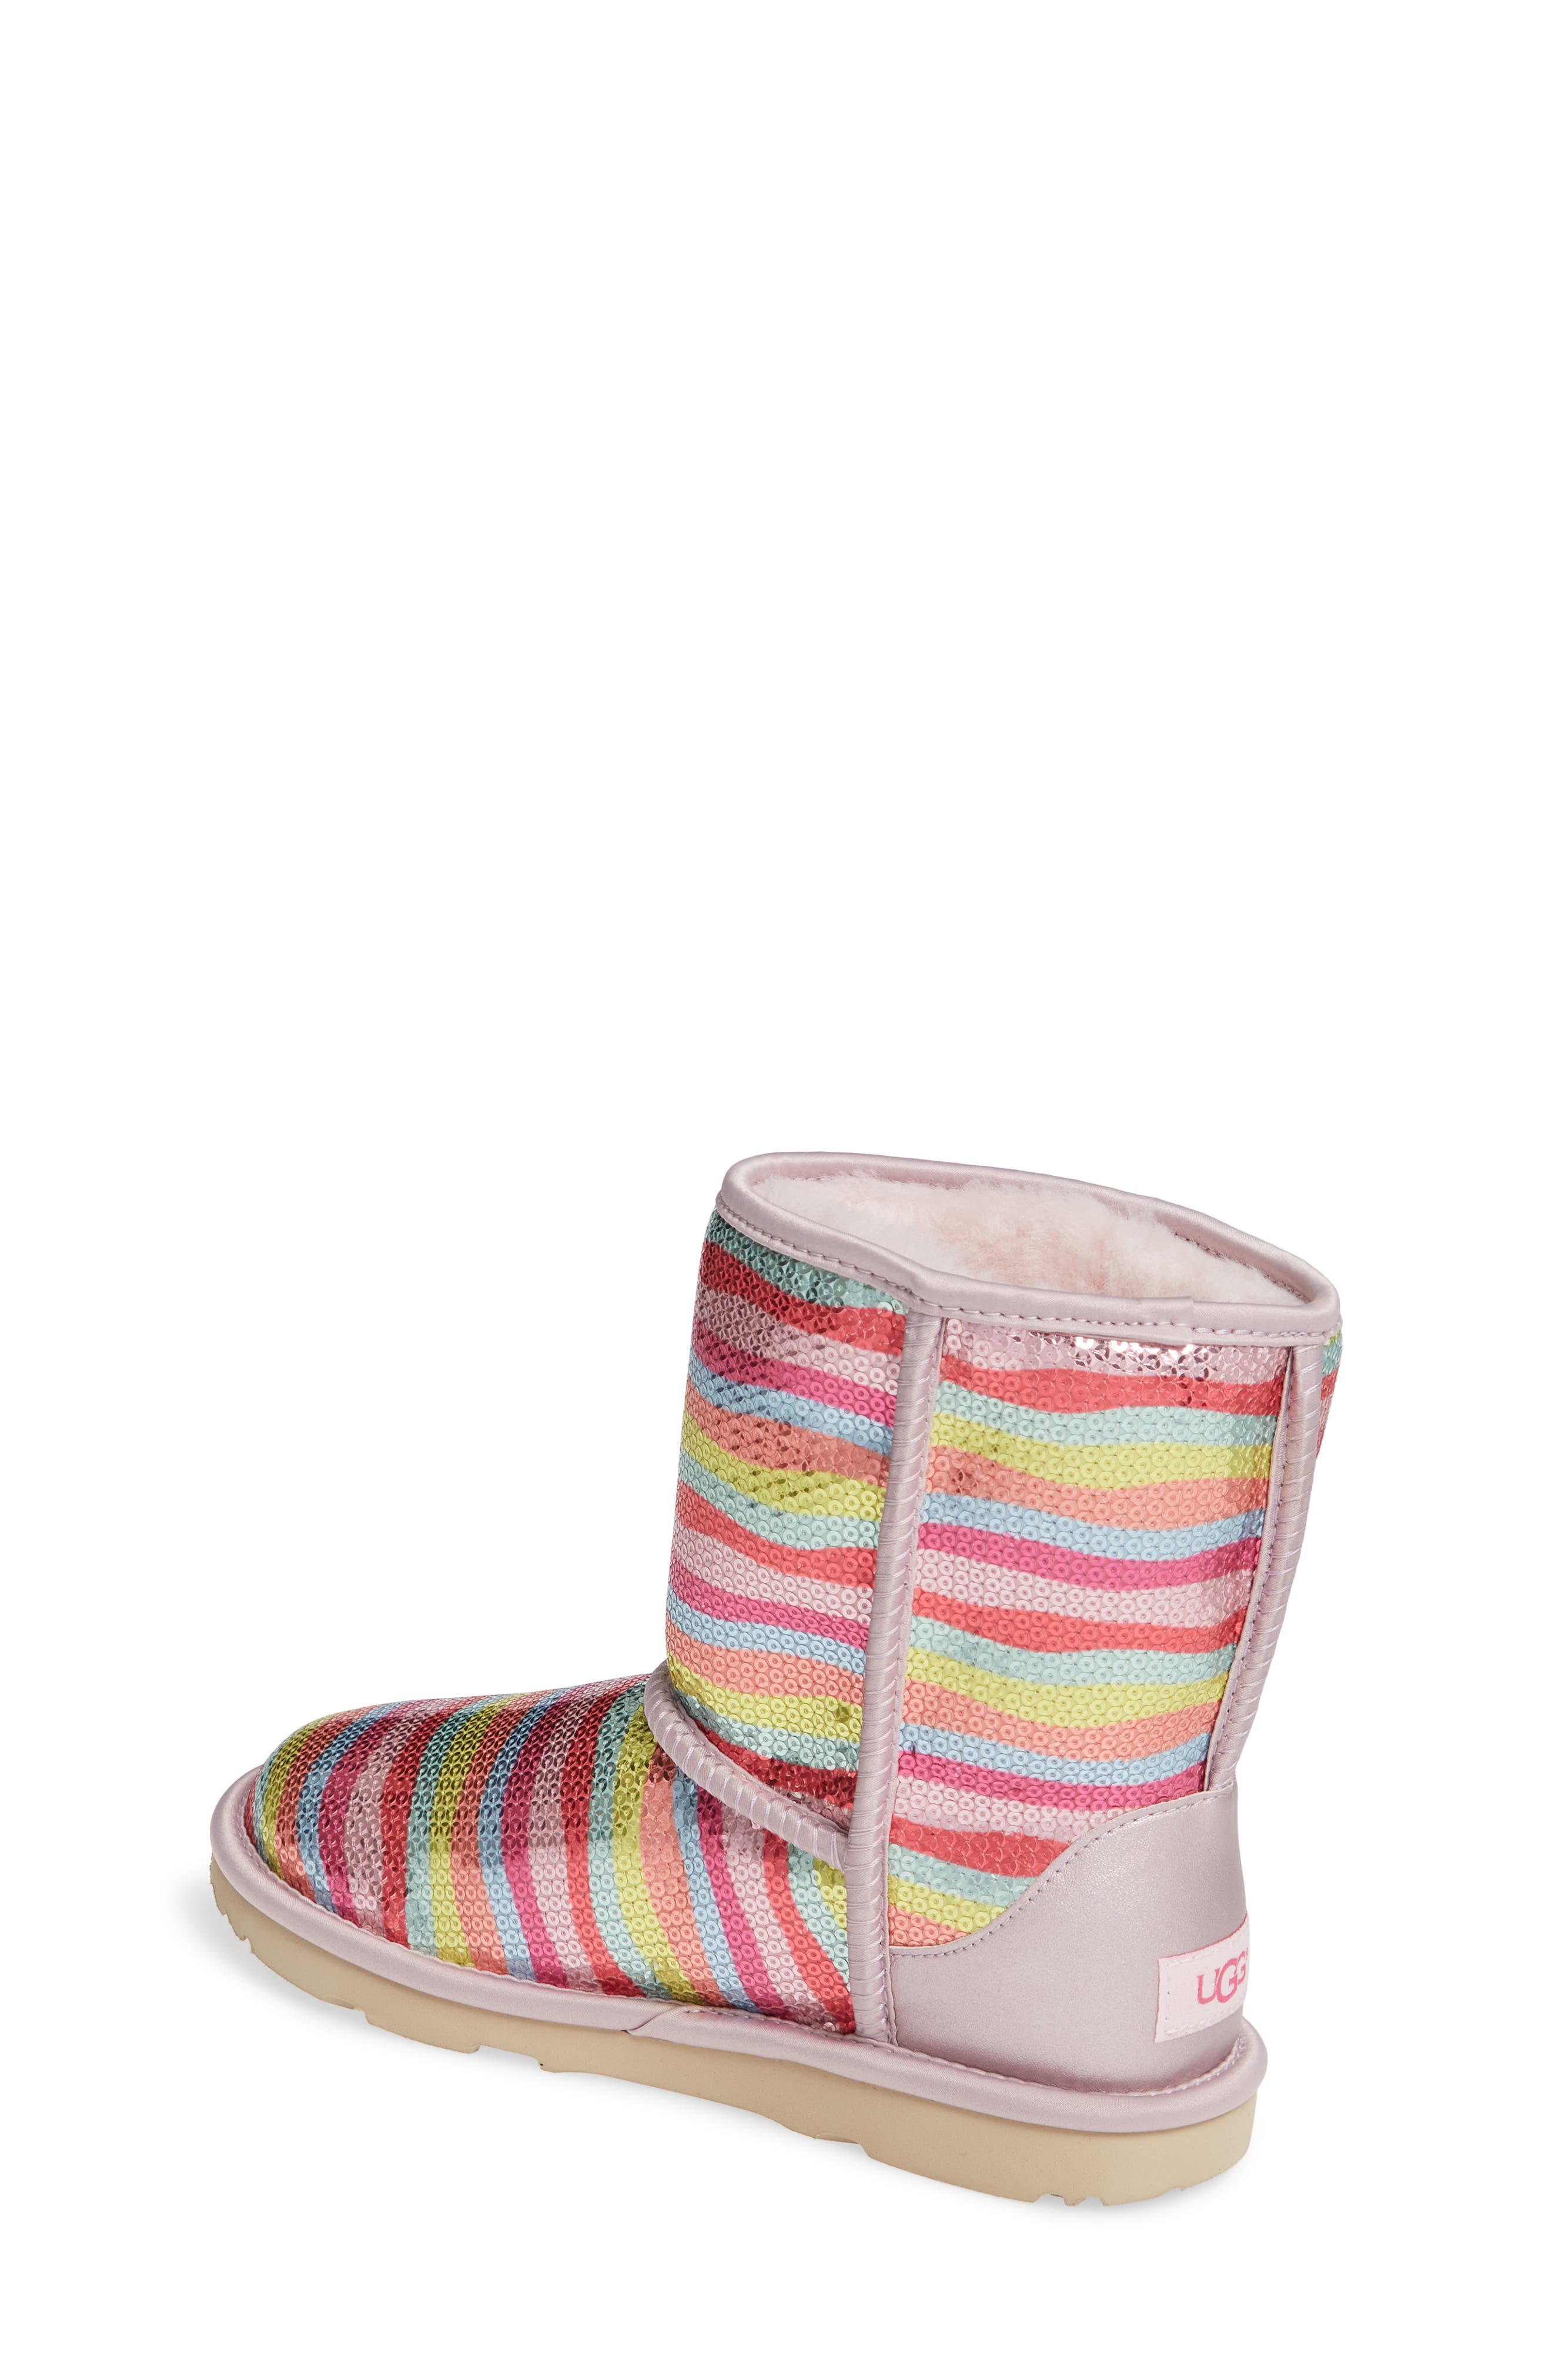 UGG<SUP>®</SUP>, Rainbow Classic Short II Sequin Stripe Boot, Alternate thumbnail 2, color, RAINBOW MULTI